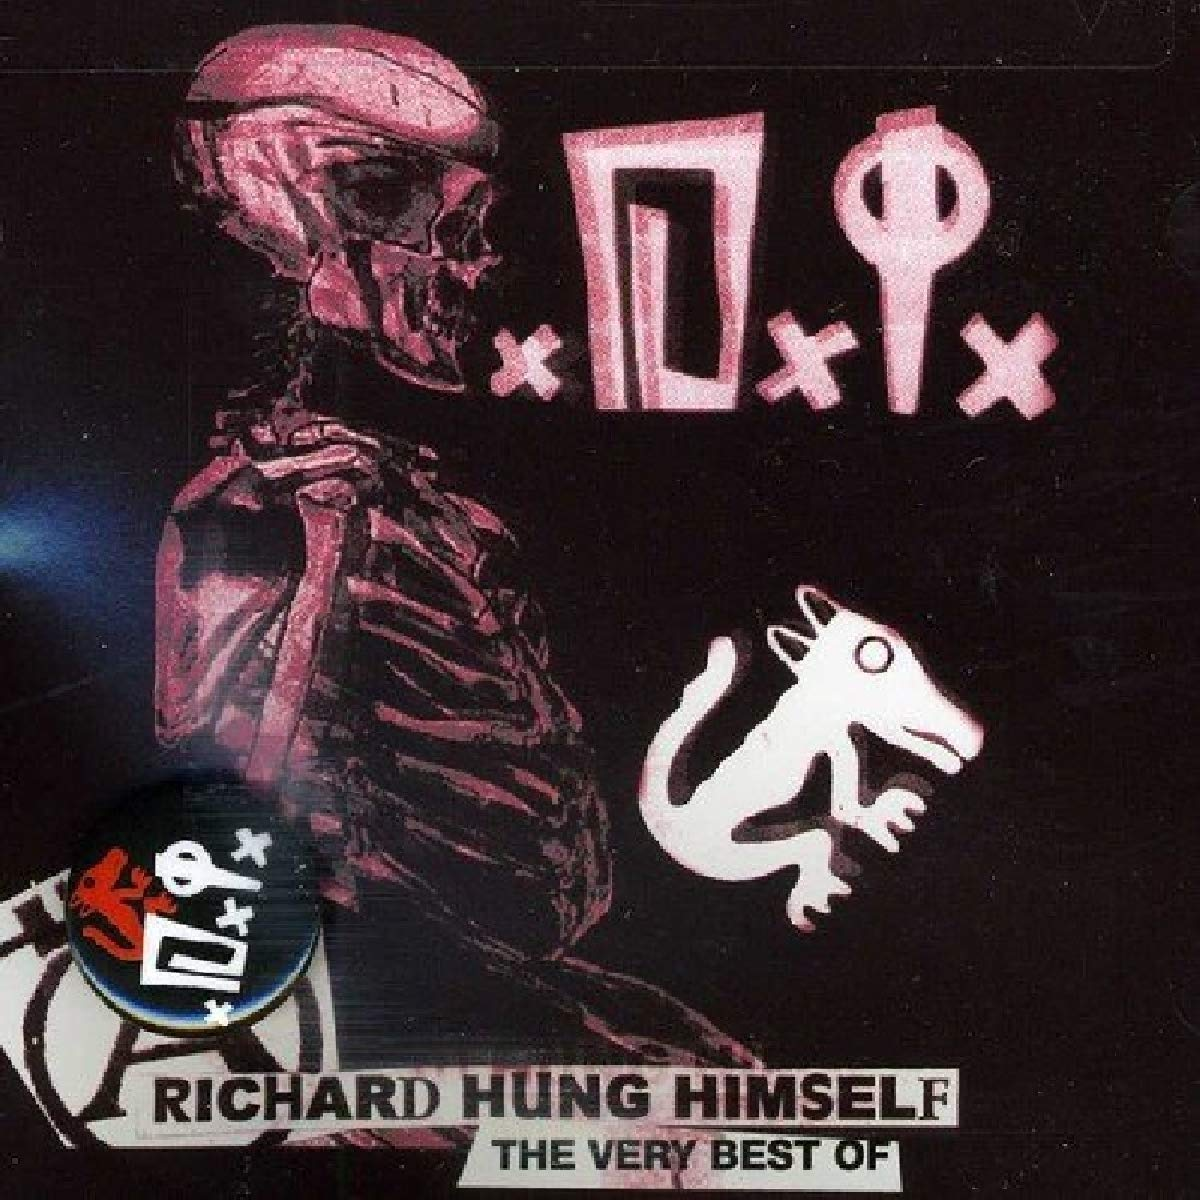 Di - Richard Hung Himself